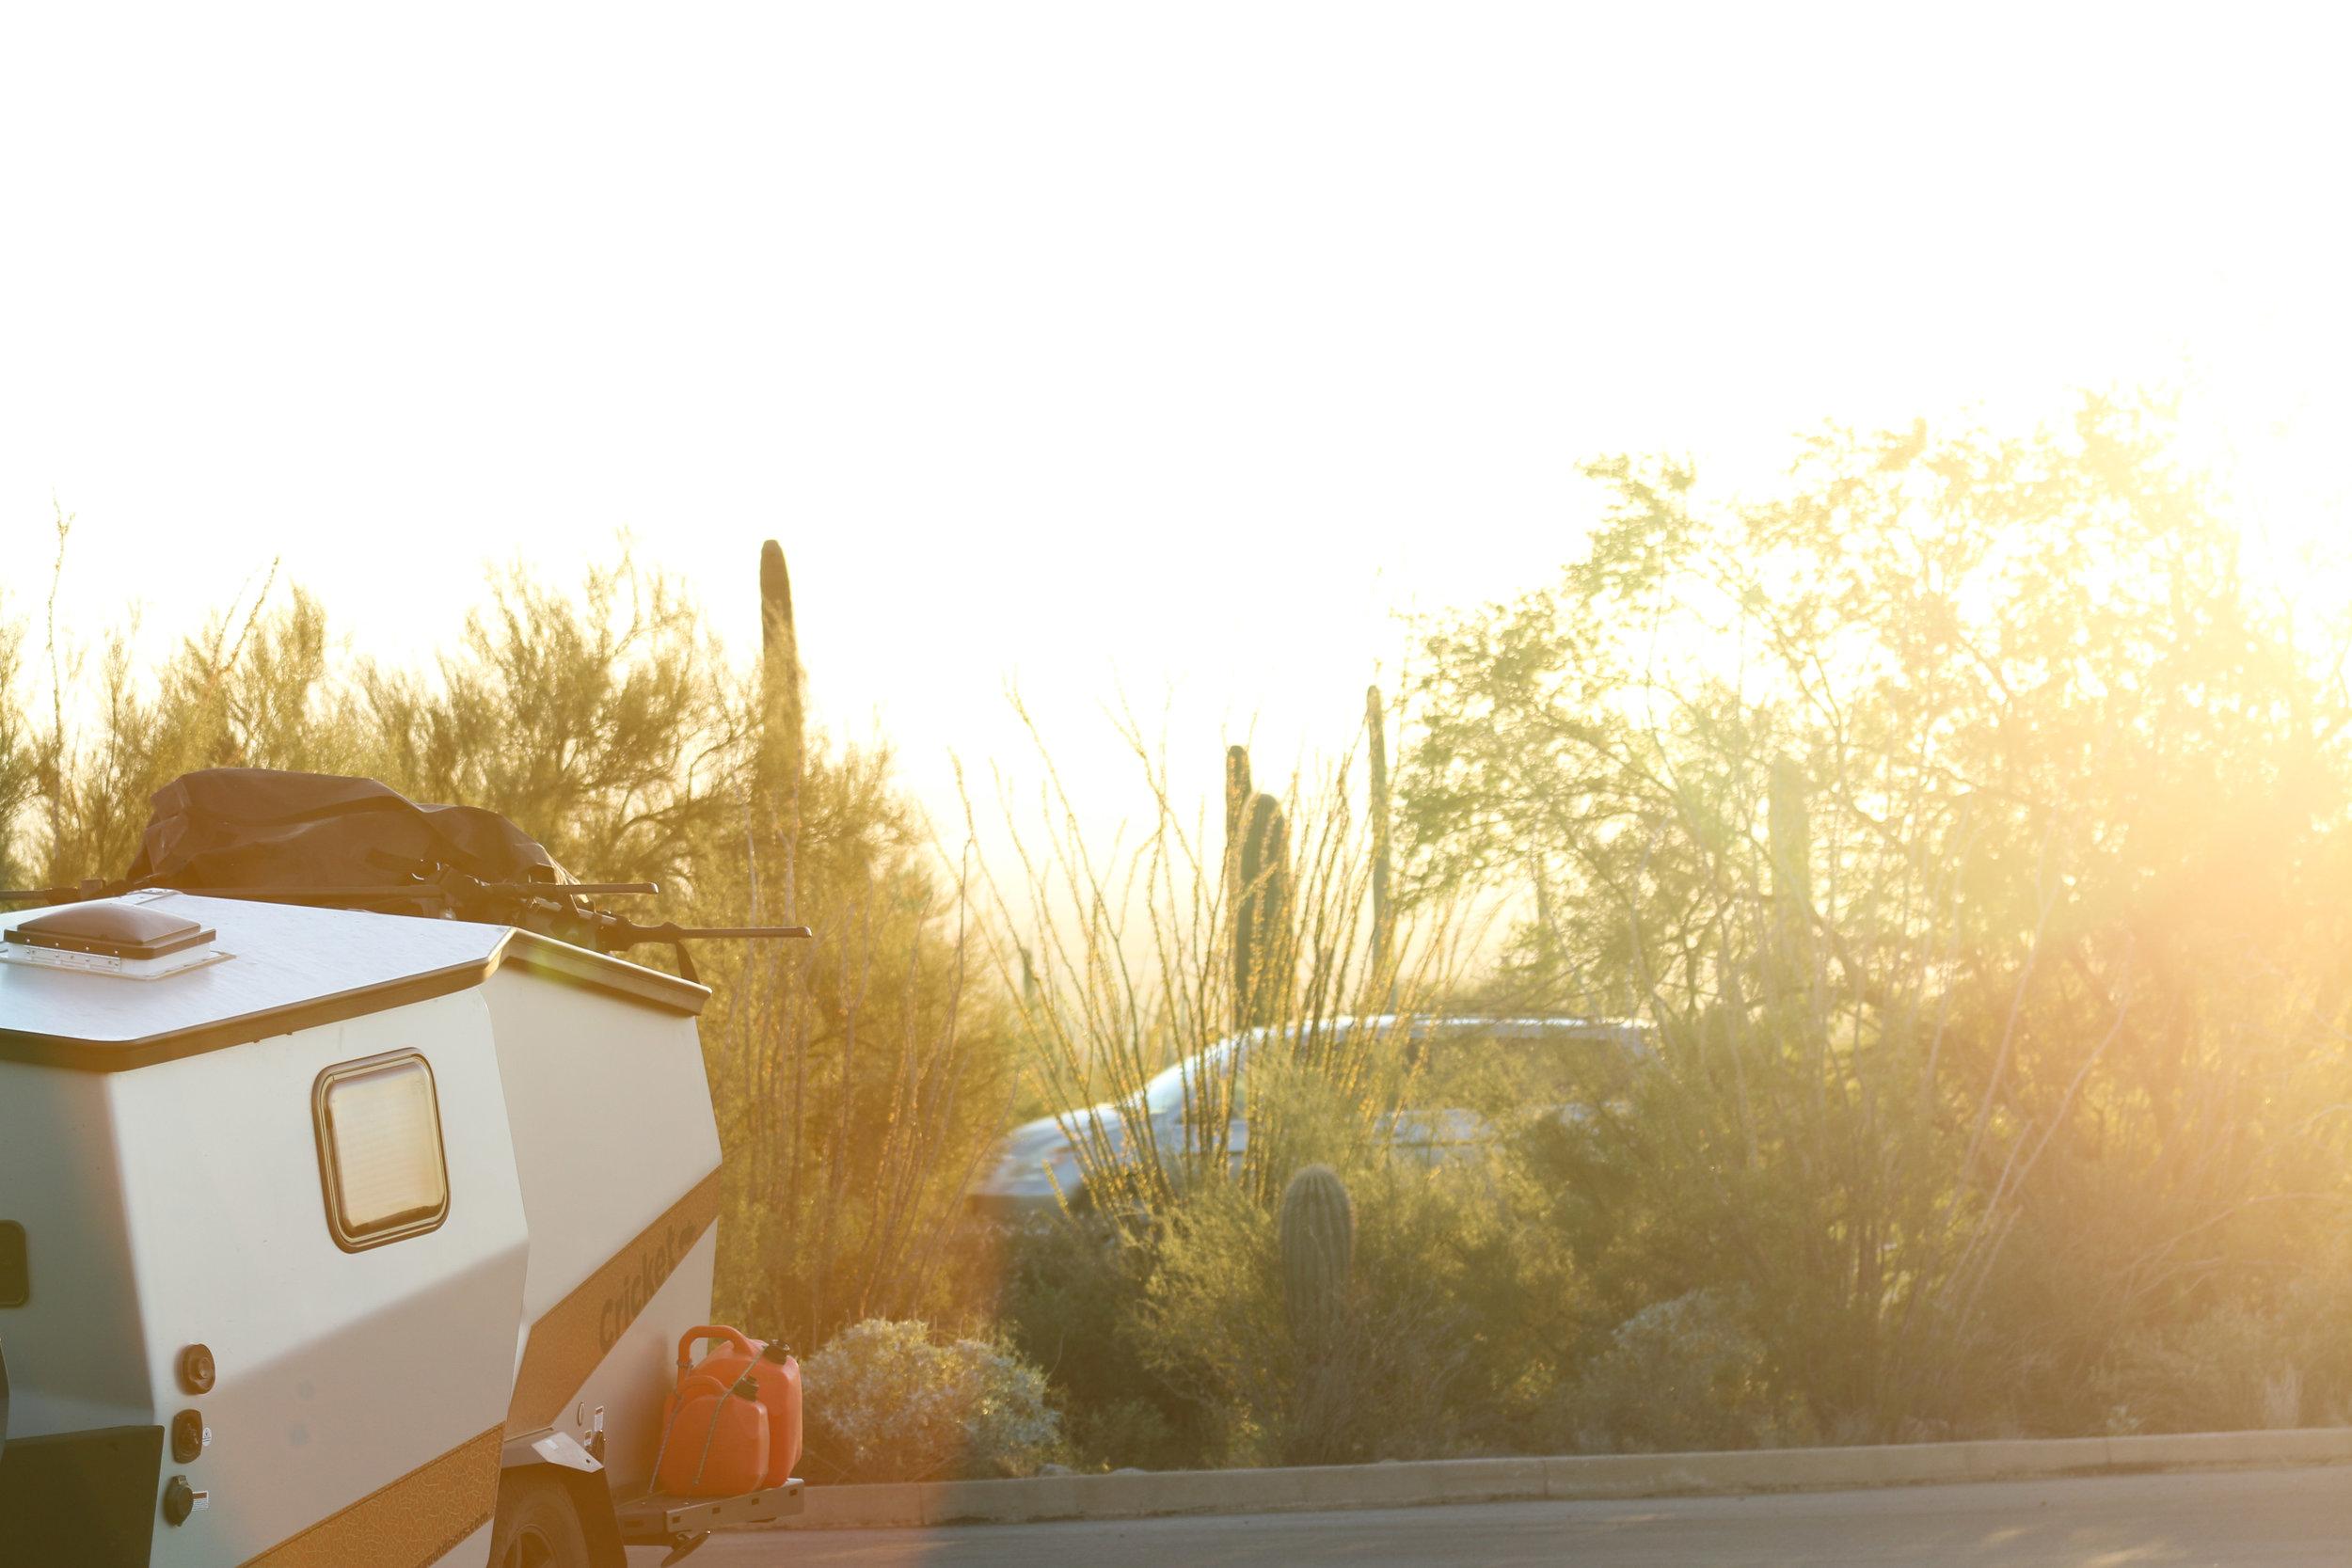 2018_Saguaro-33.jpg